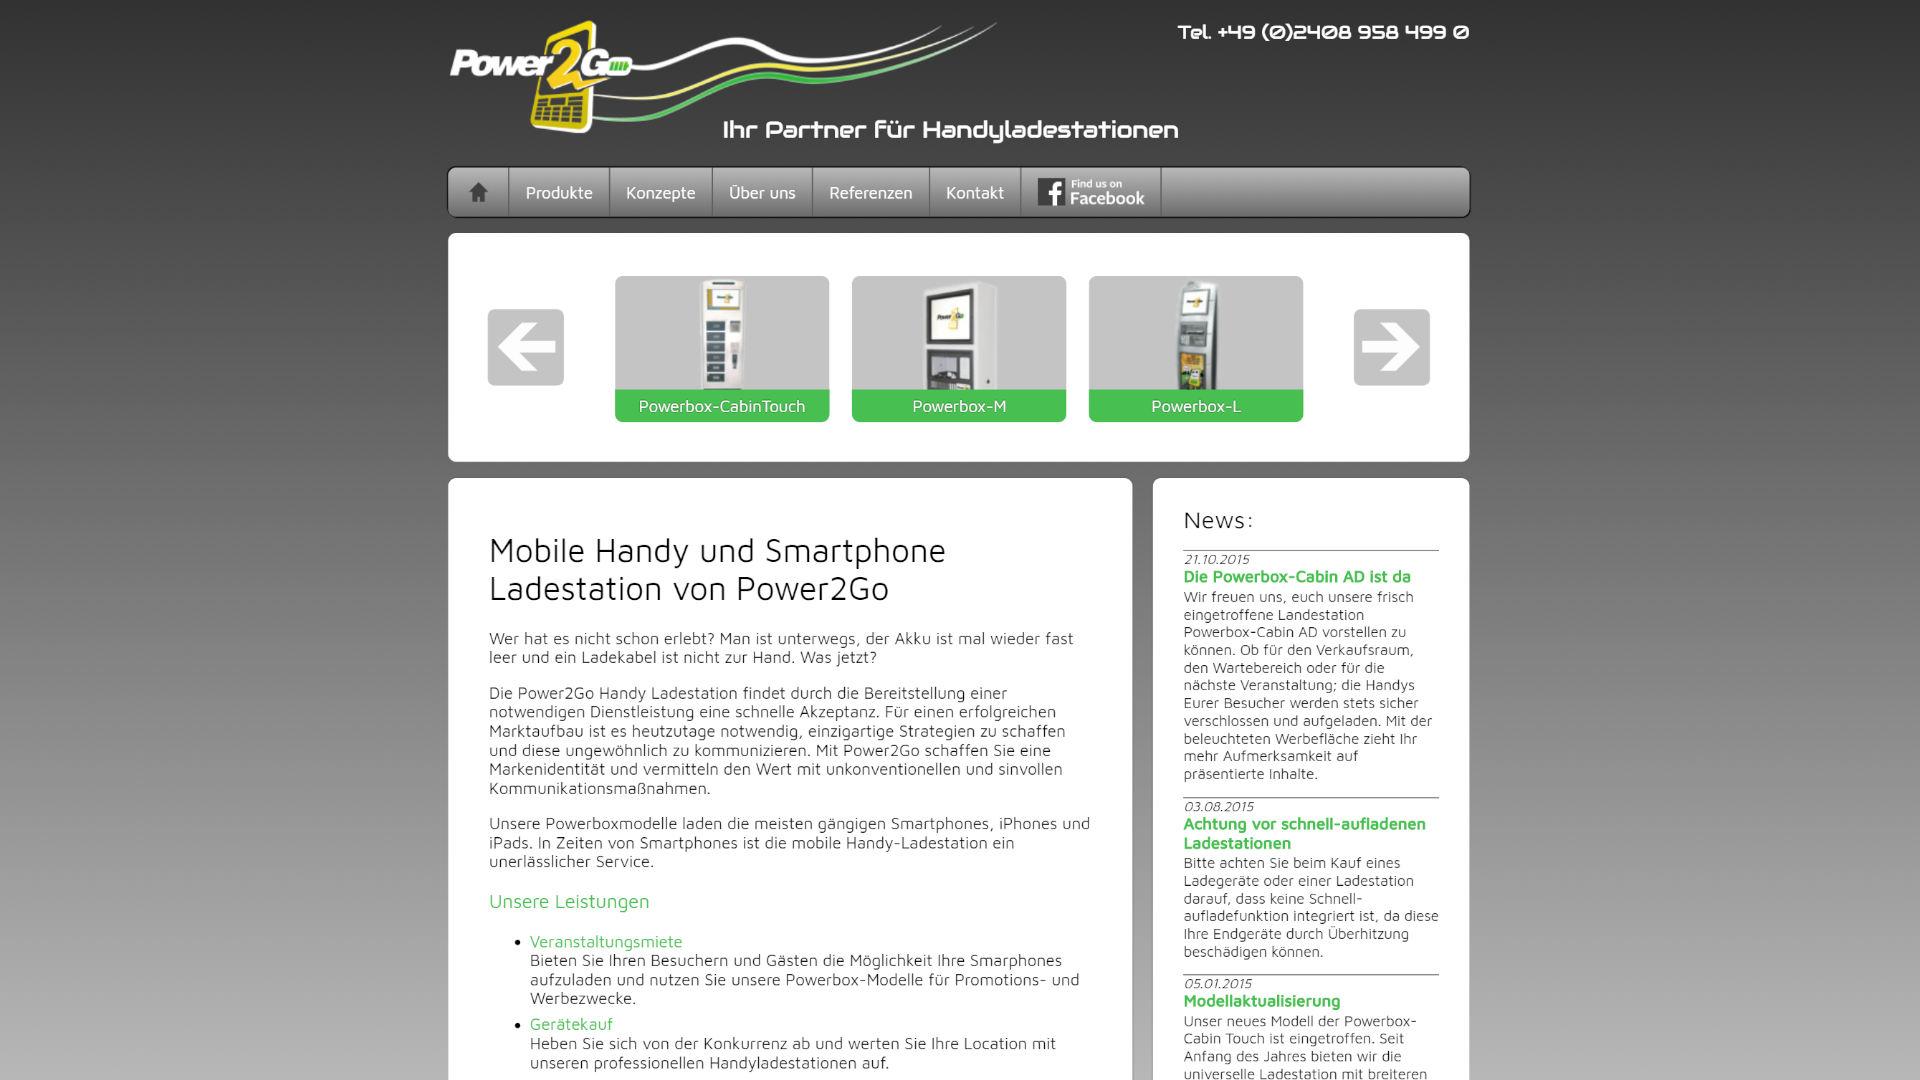 Screenshot: Homepage Power2Go Handyladestationen